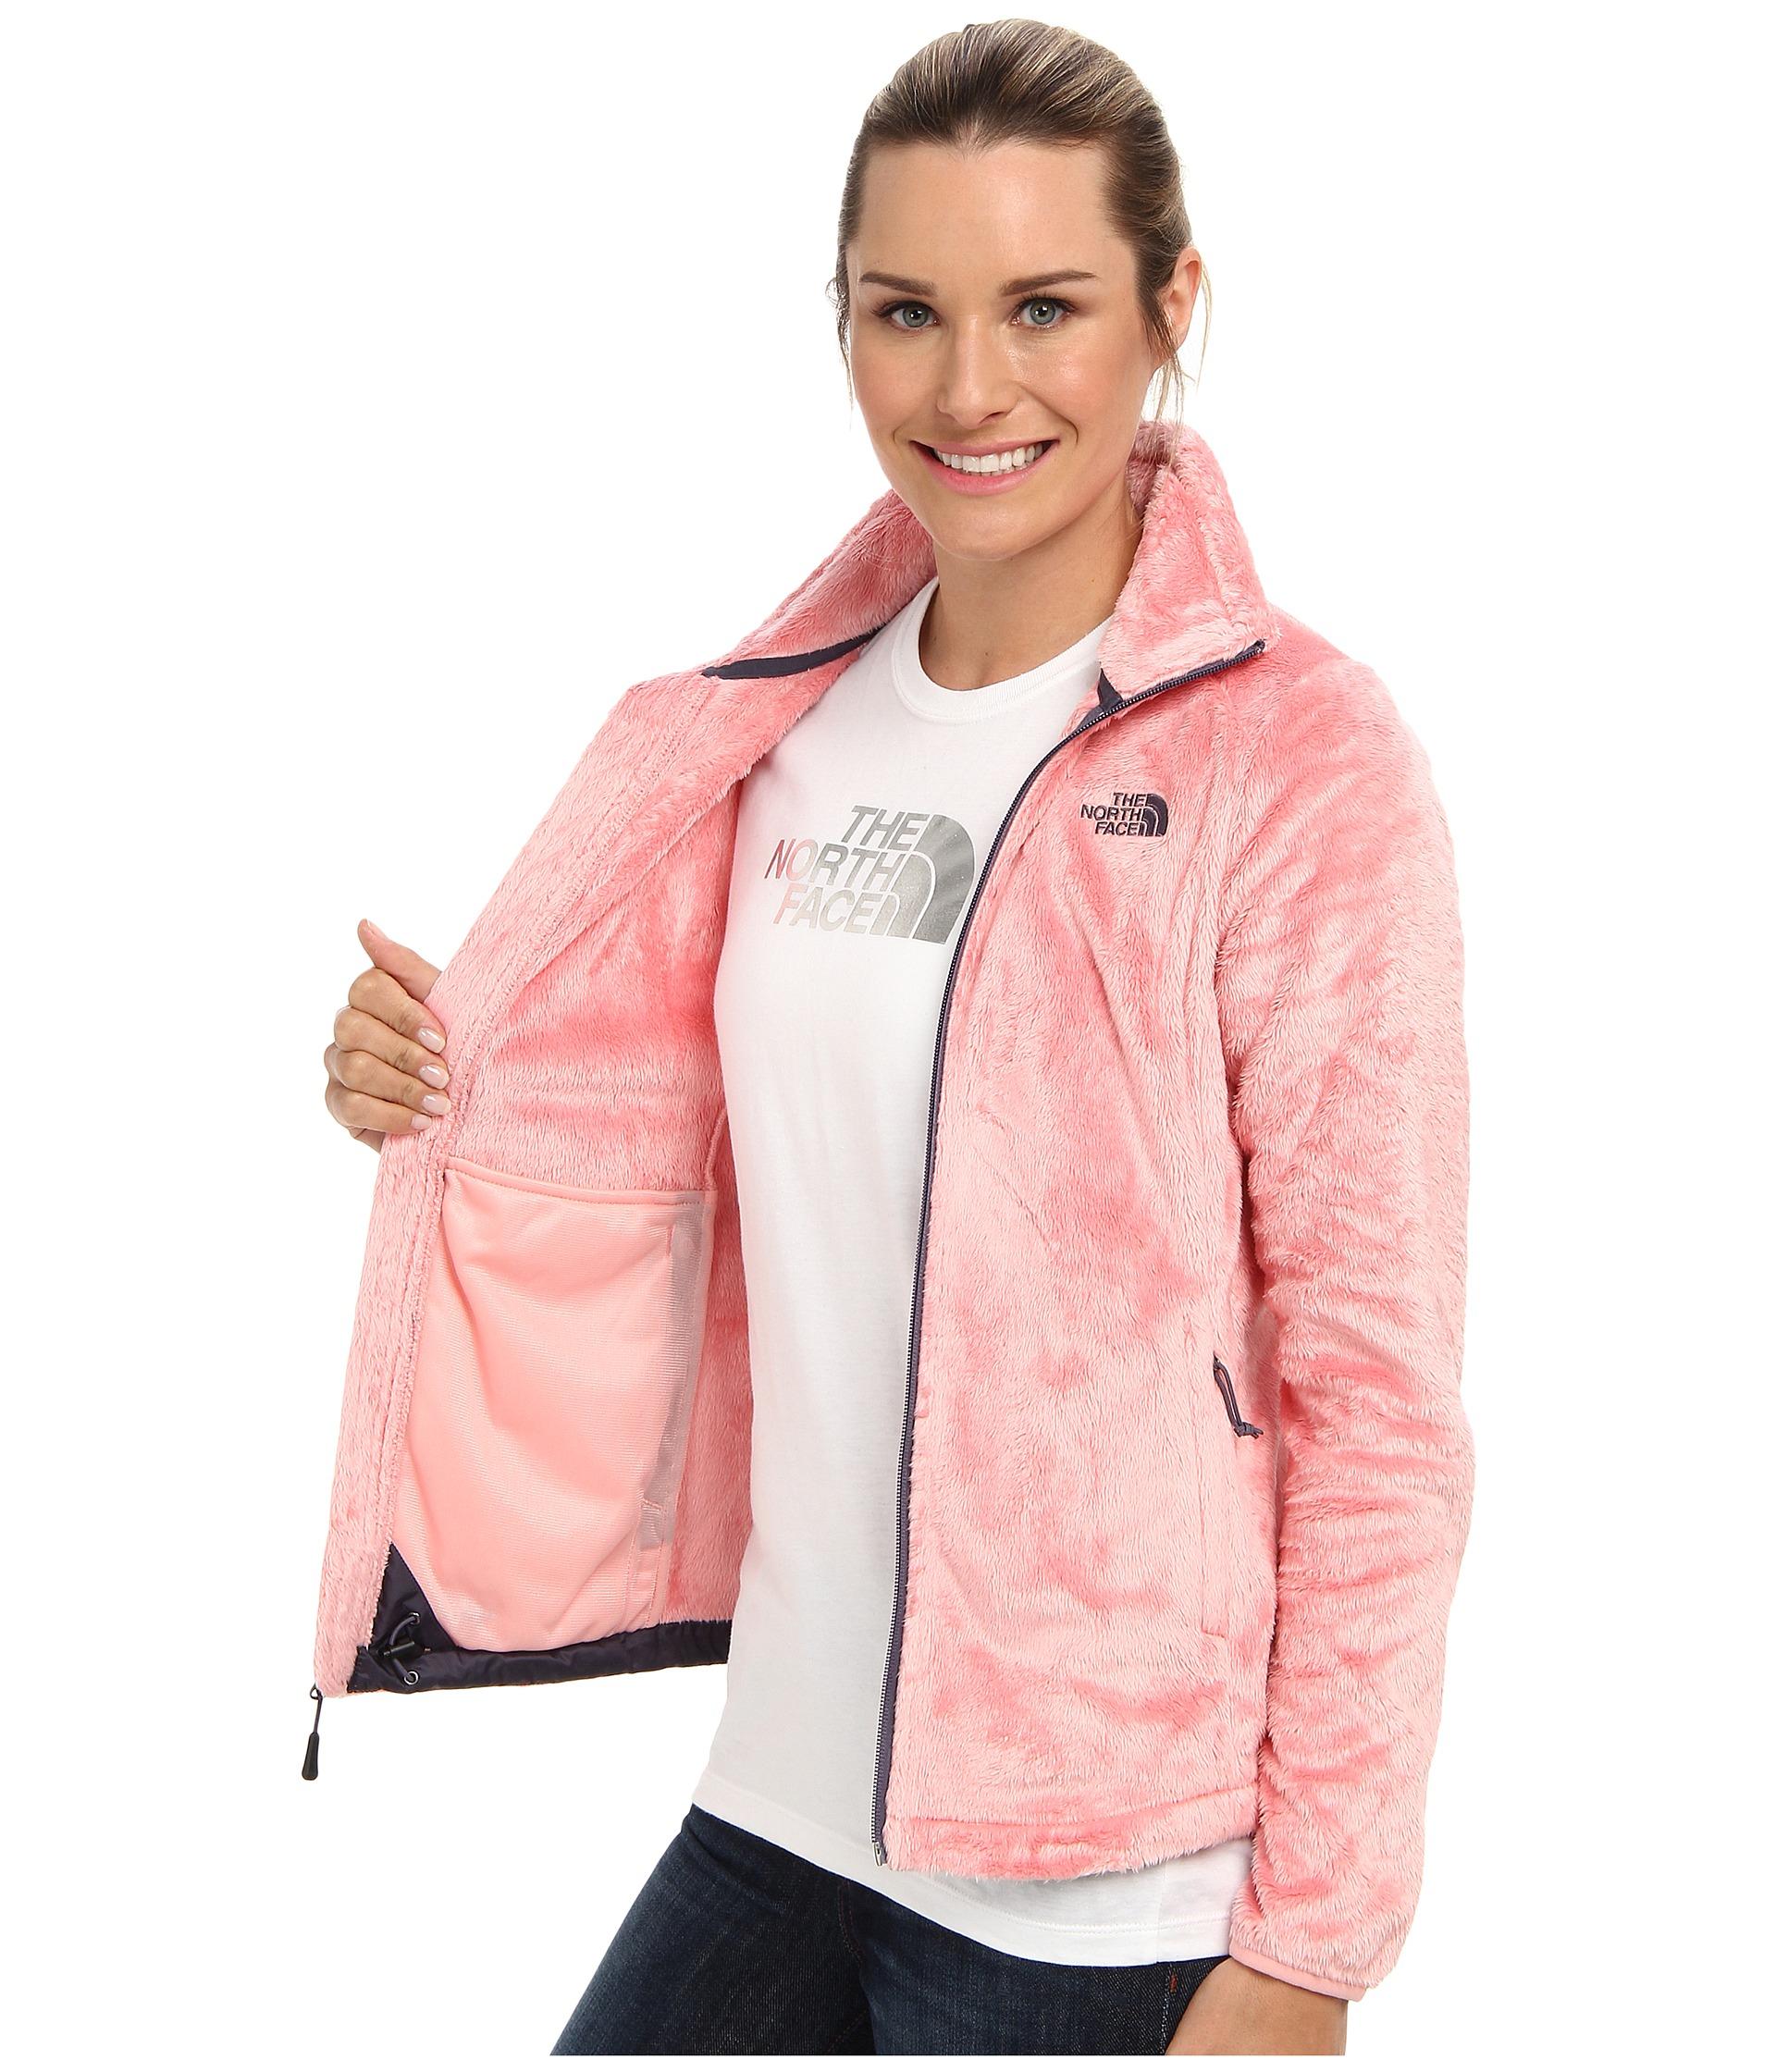 The North Face Osito 2 Fleece Jacket